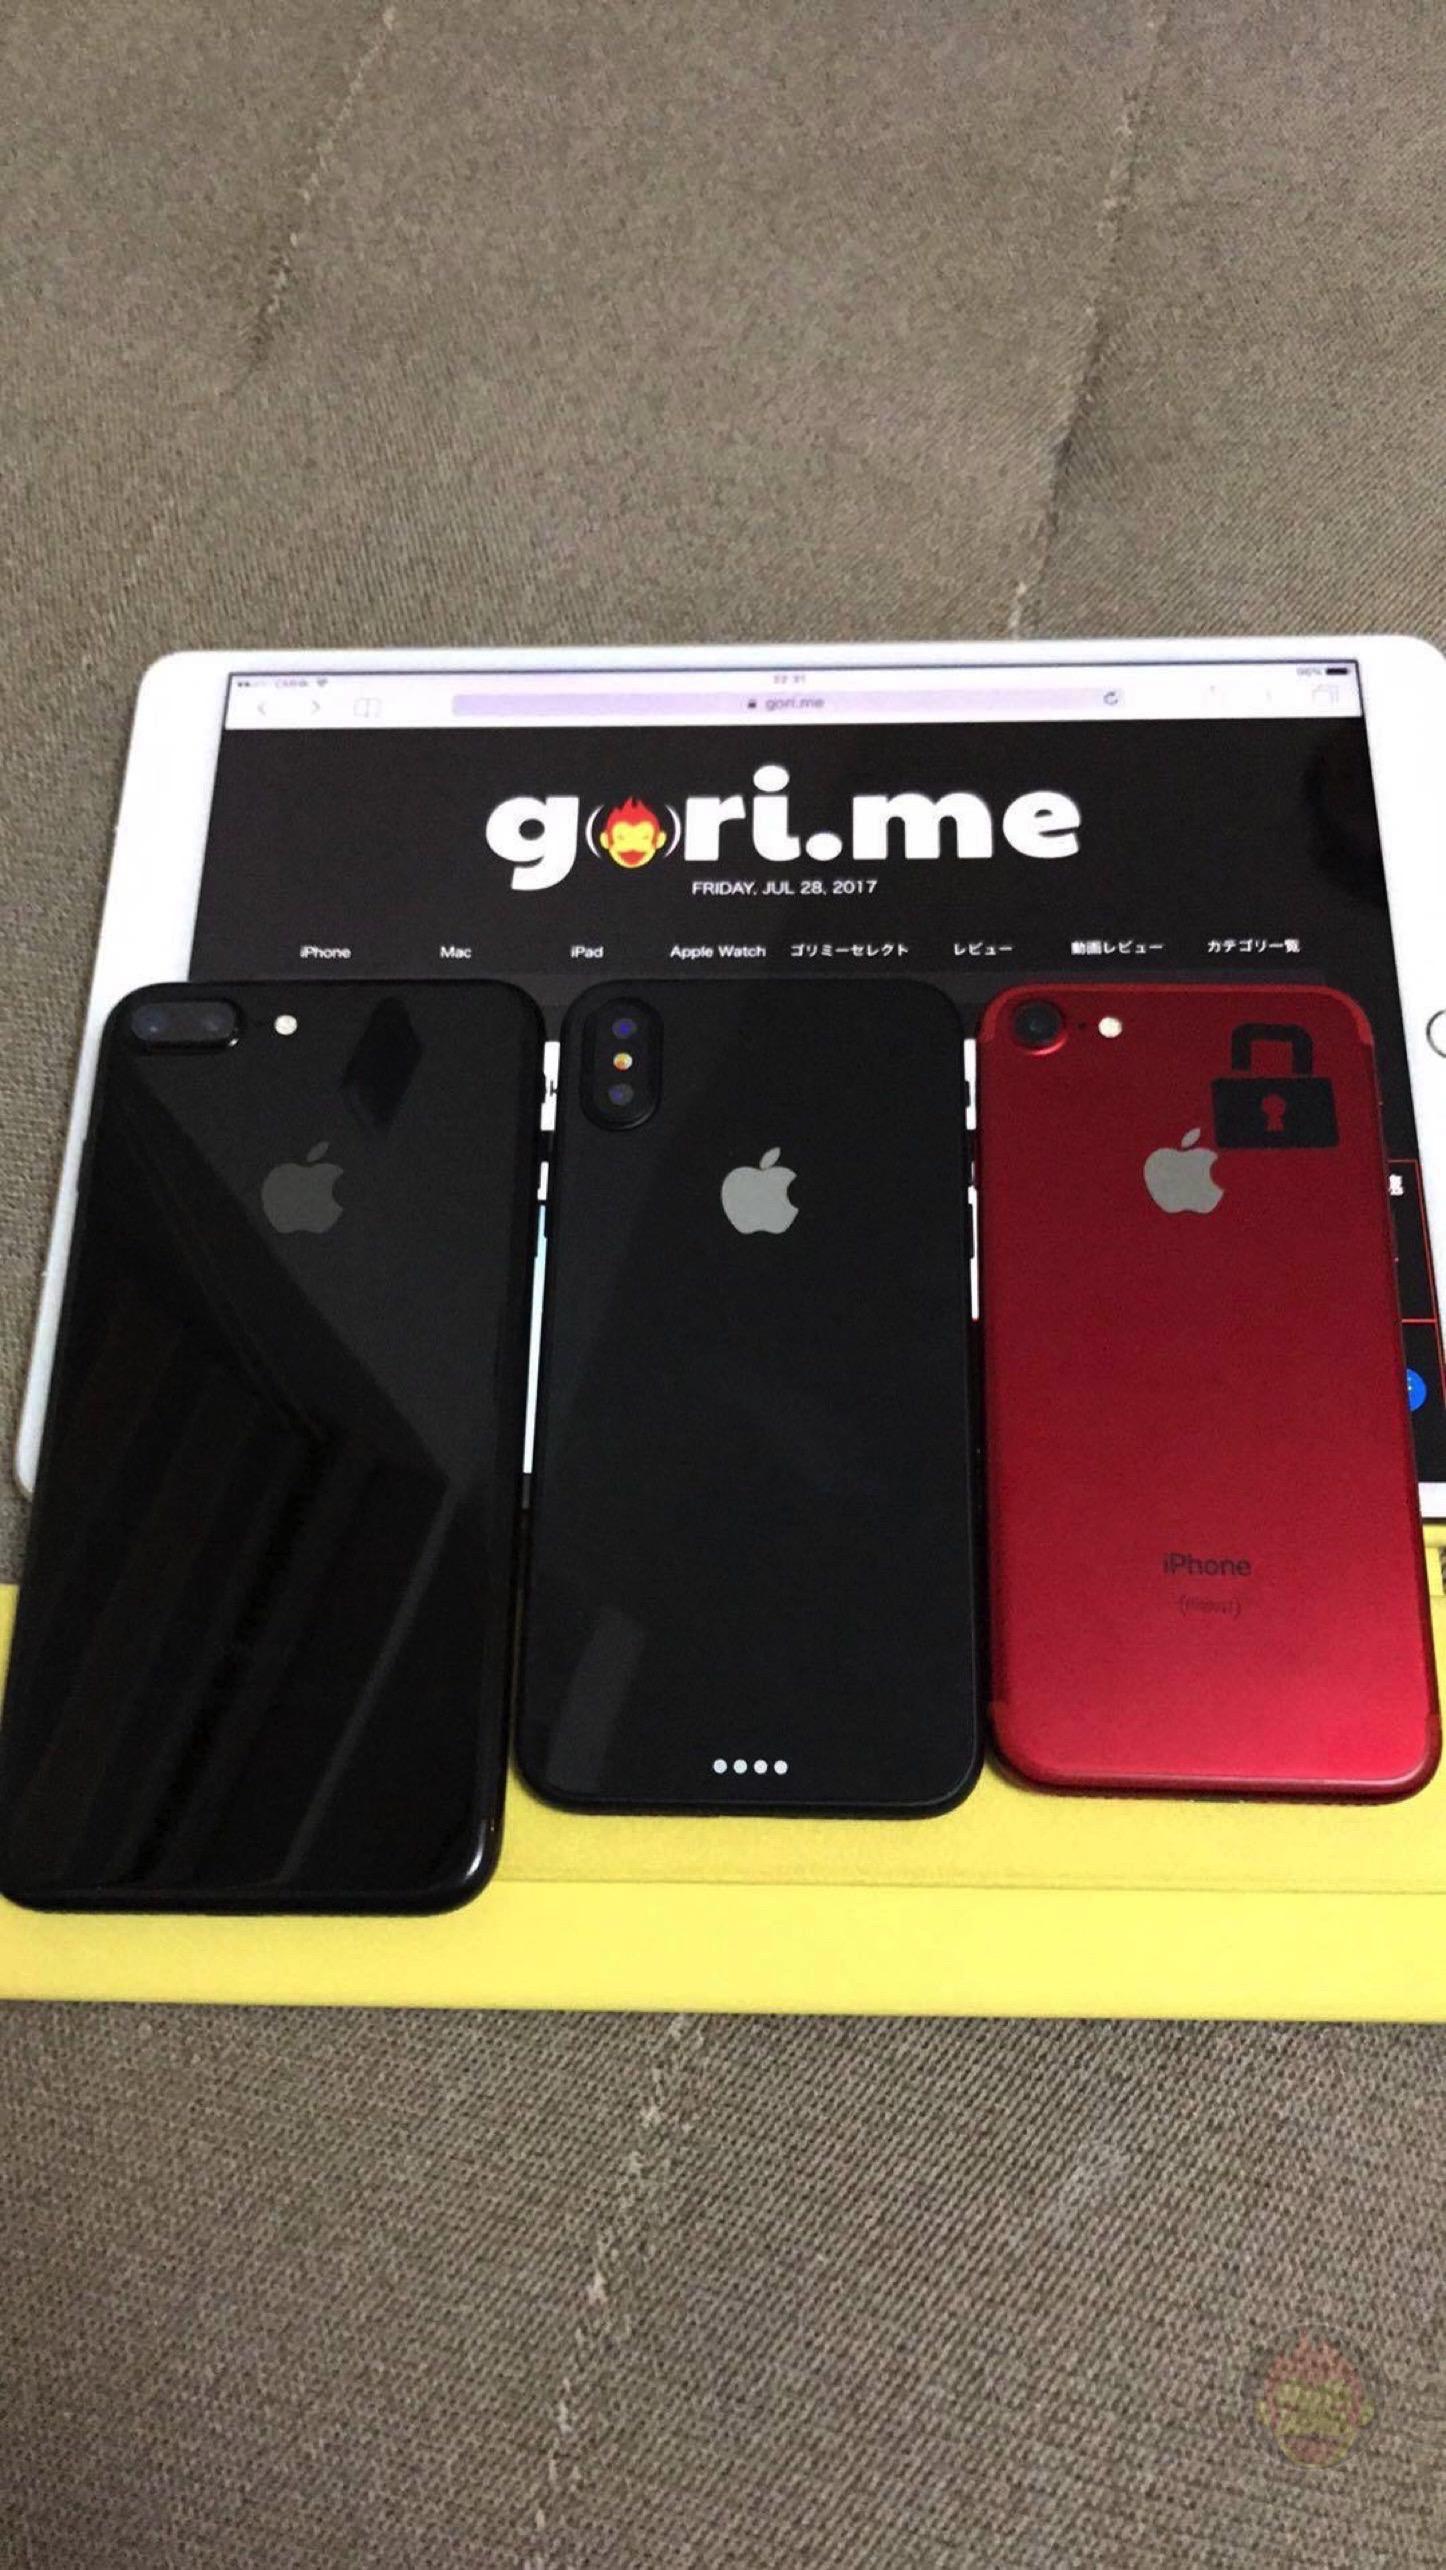 iPhone-Pro-8-Edition-Mockup-GoriMe-09.jpg